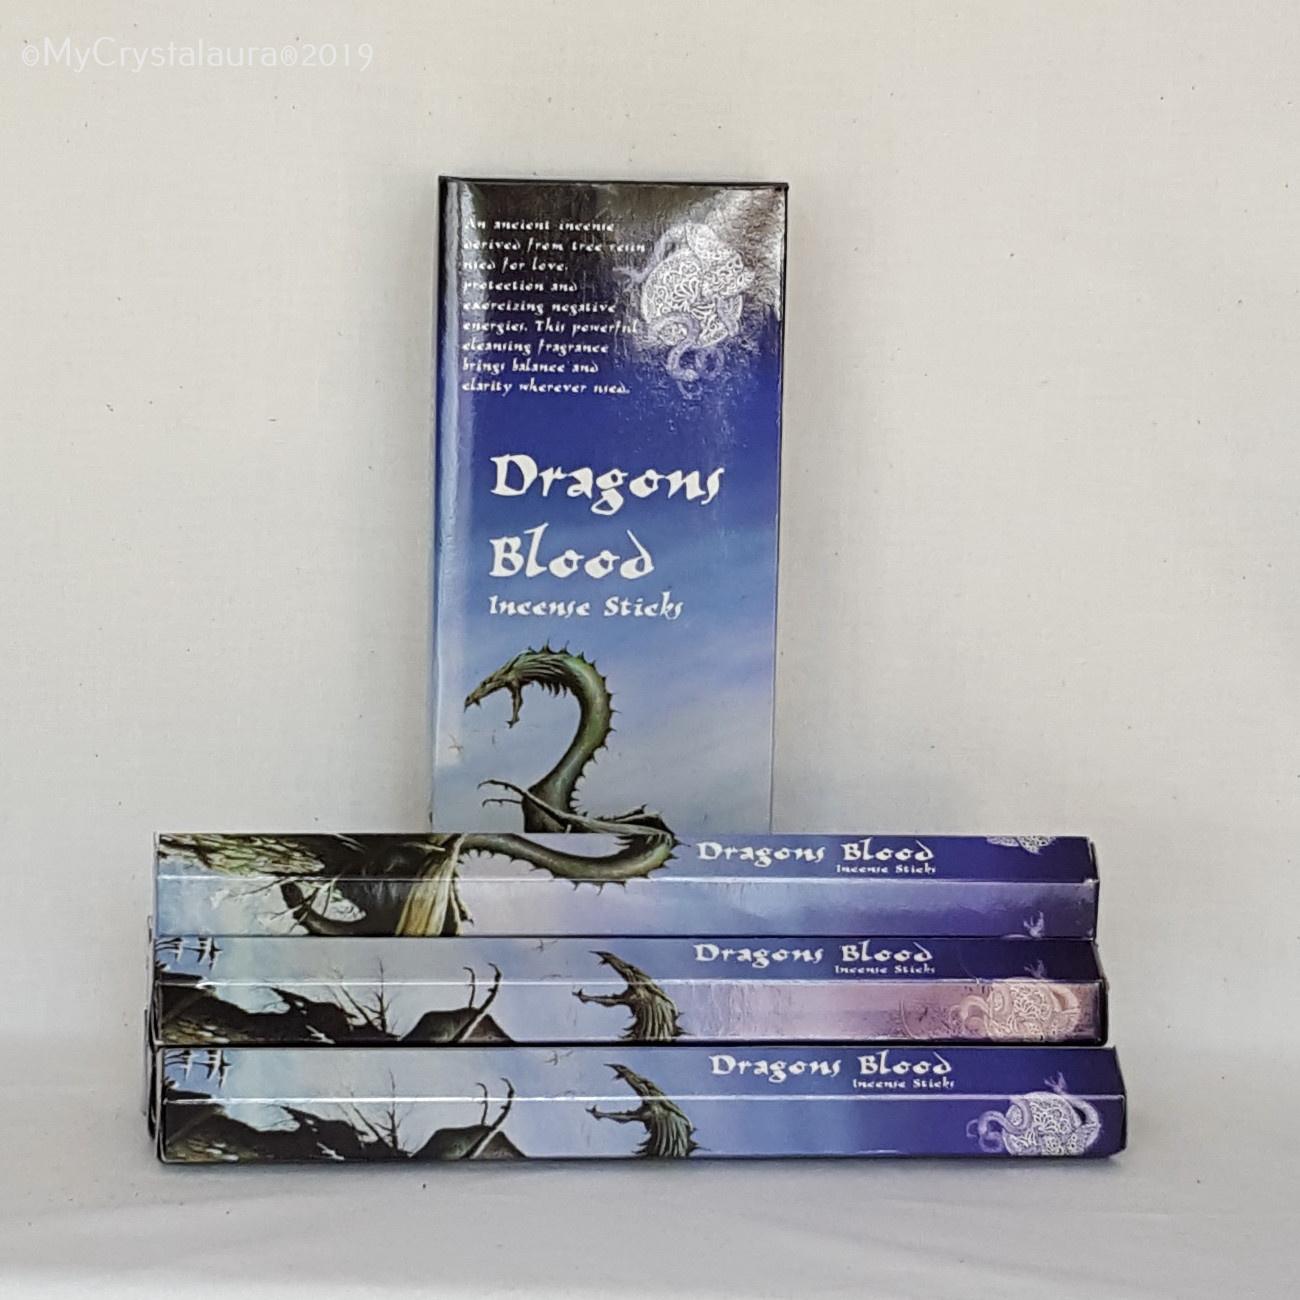 Dragons Blood Incense Sticks Kamini Incense Sticks My Crystalaura